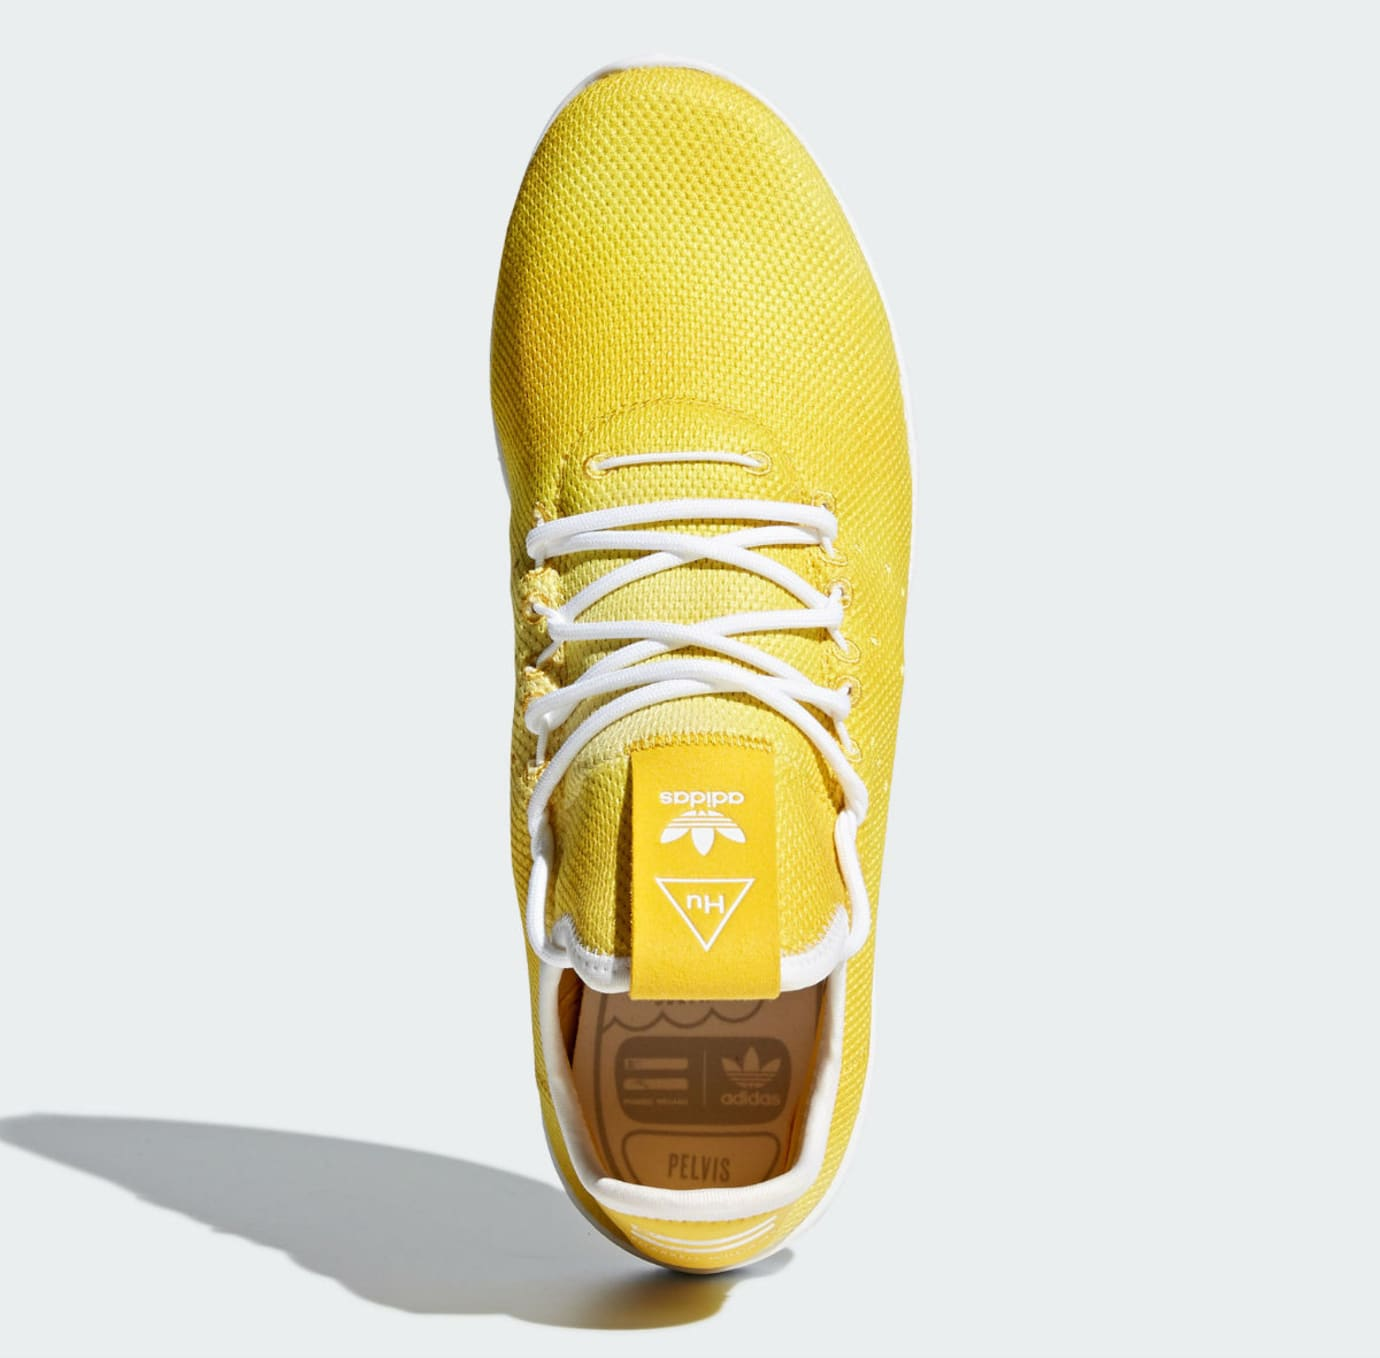 72c0fb845baaf Pharrell x Adidas Tennis Hu Holi Bright Yellow Release Date DA9617 ...